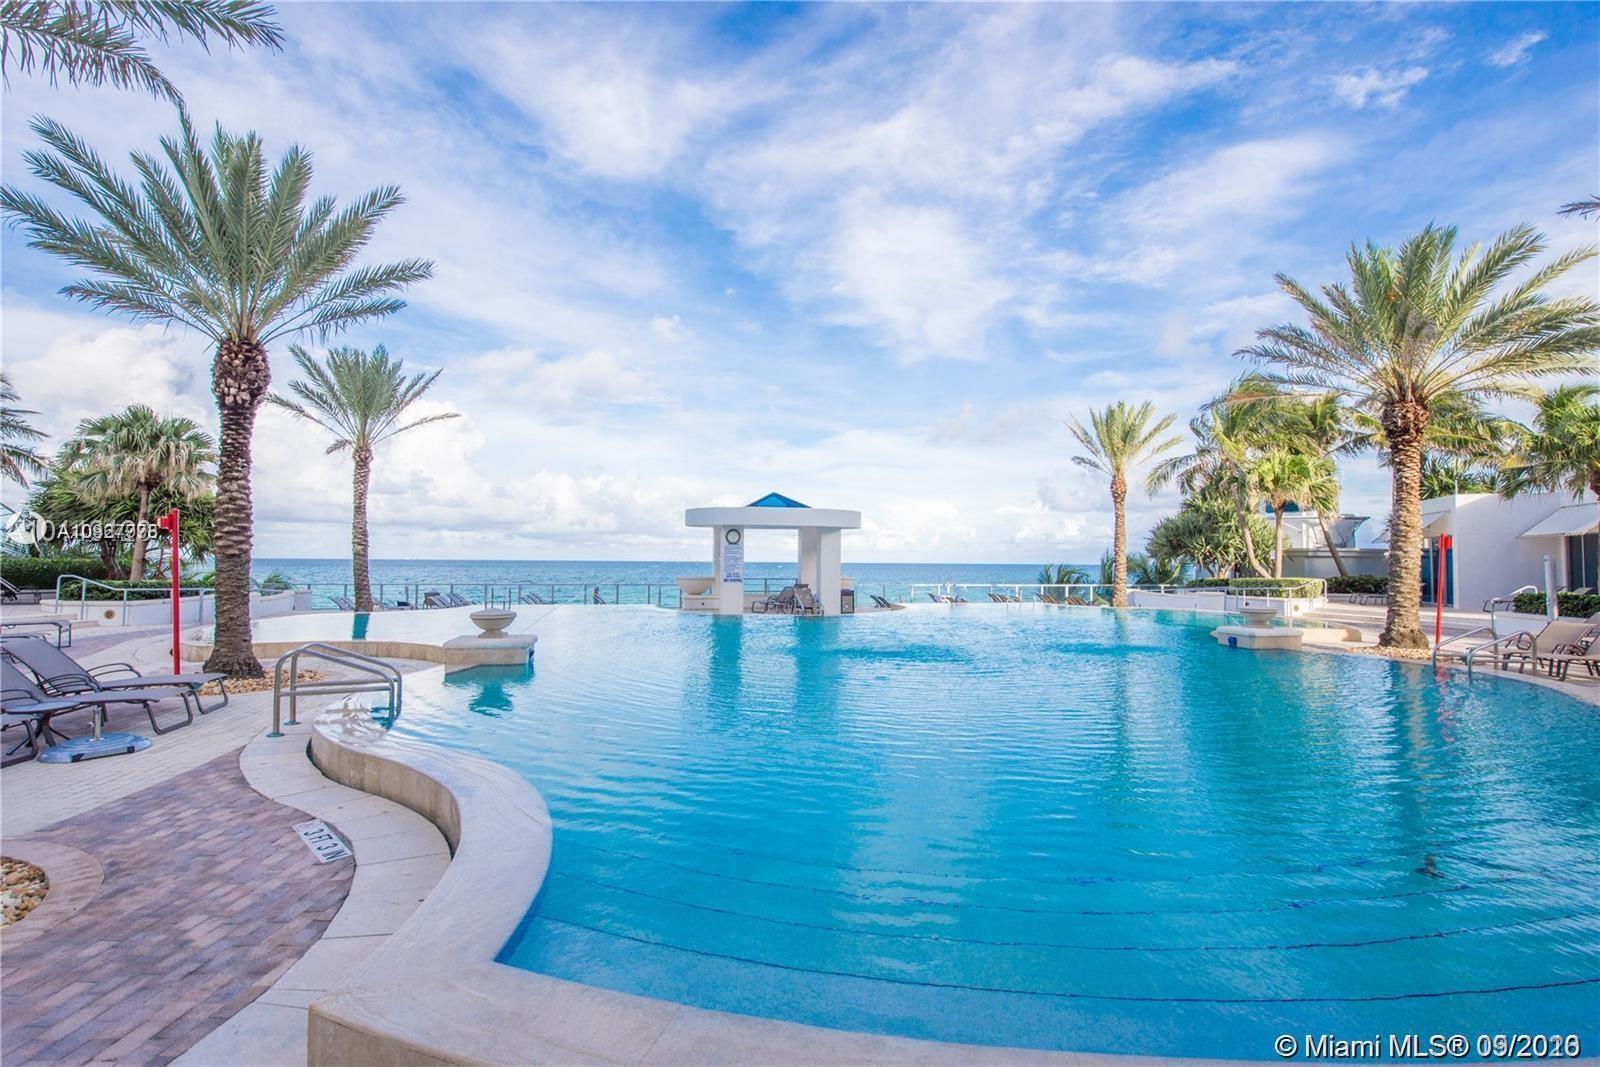 Exclusive Ocean Front Building! Ocean Views Furnished 3 Bedrooms/3,5 Bathrooms Private Elevators To